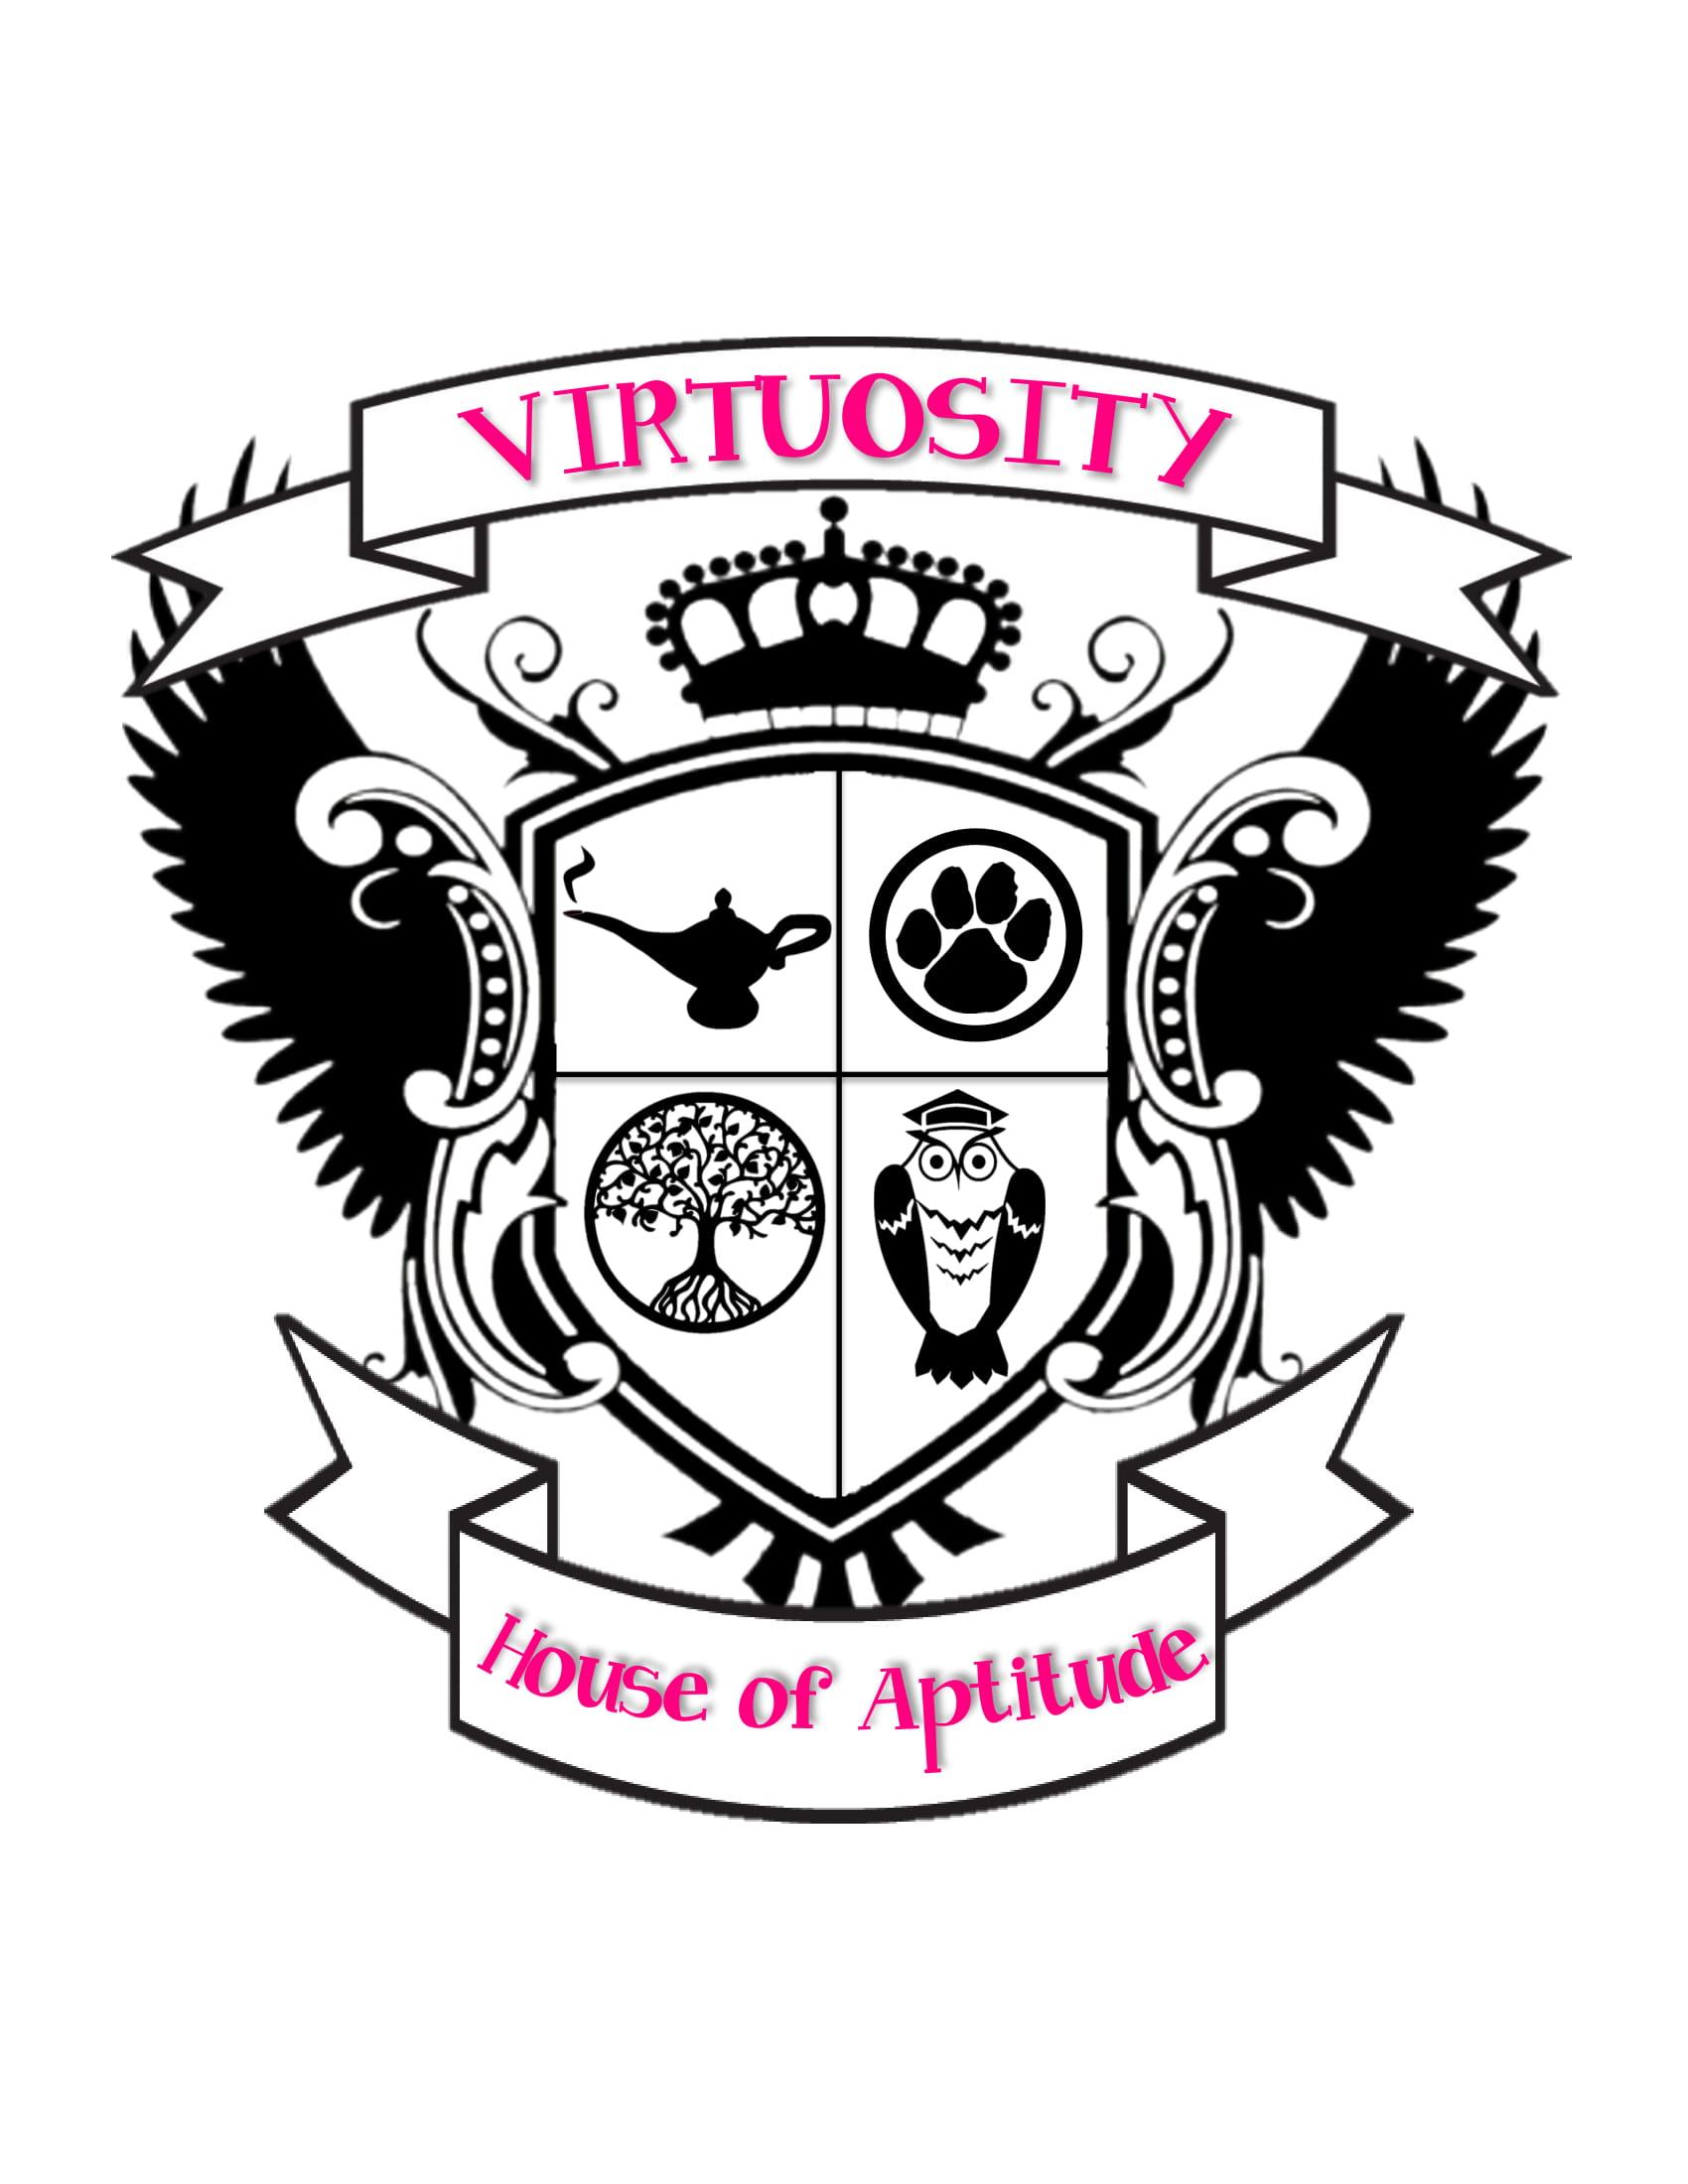 Virtuosity crest